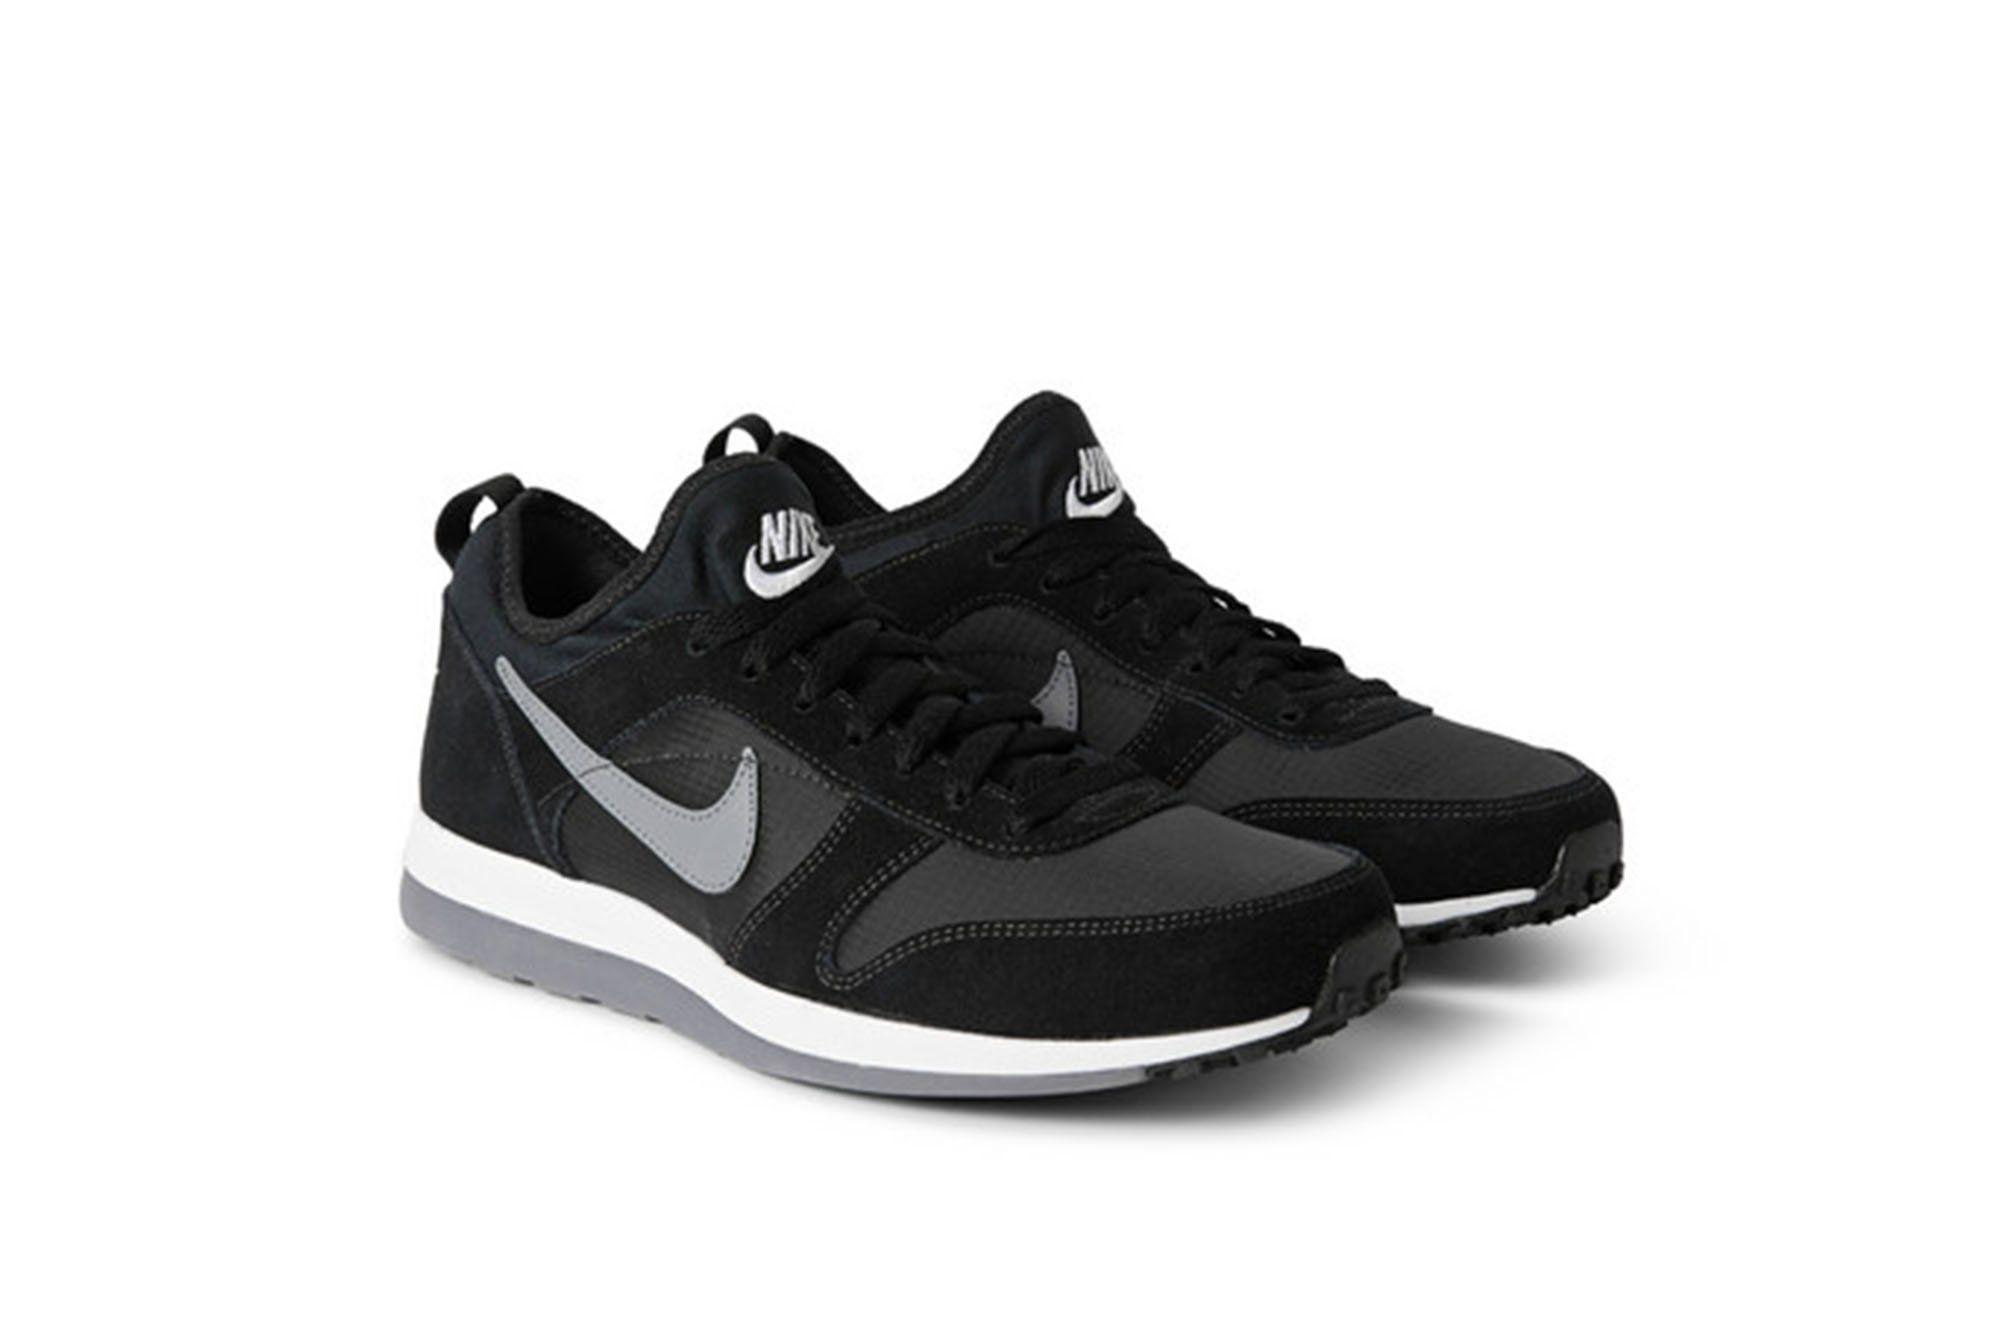 buy online 559a2 ae0c2 18 Fall Wardrobe Essentials to Buy Now   GQ. 18 Fall Wardrobe Essentials to Buy  Now   GQ Suede Sneakers, Sneakers Nike ...